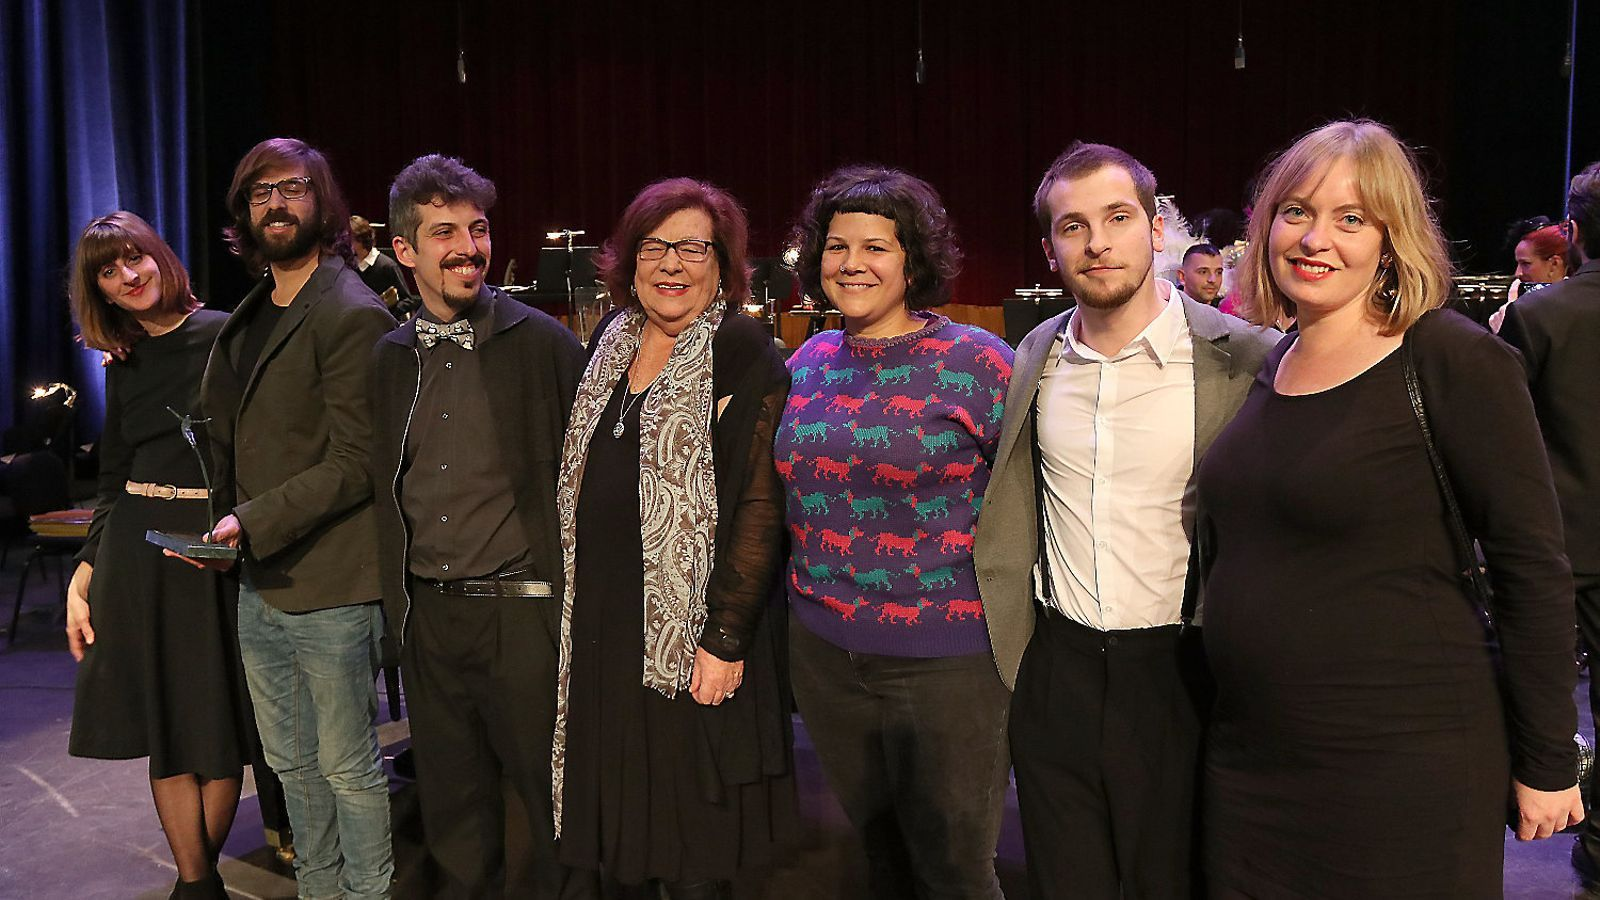 Clara Ingold, Joan Fullana, Joan Tomàs, Aina Frau, Esther López, José Artero i Bàrbara Ferrer, premiats per la peça de tetera #Comviure.